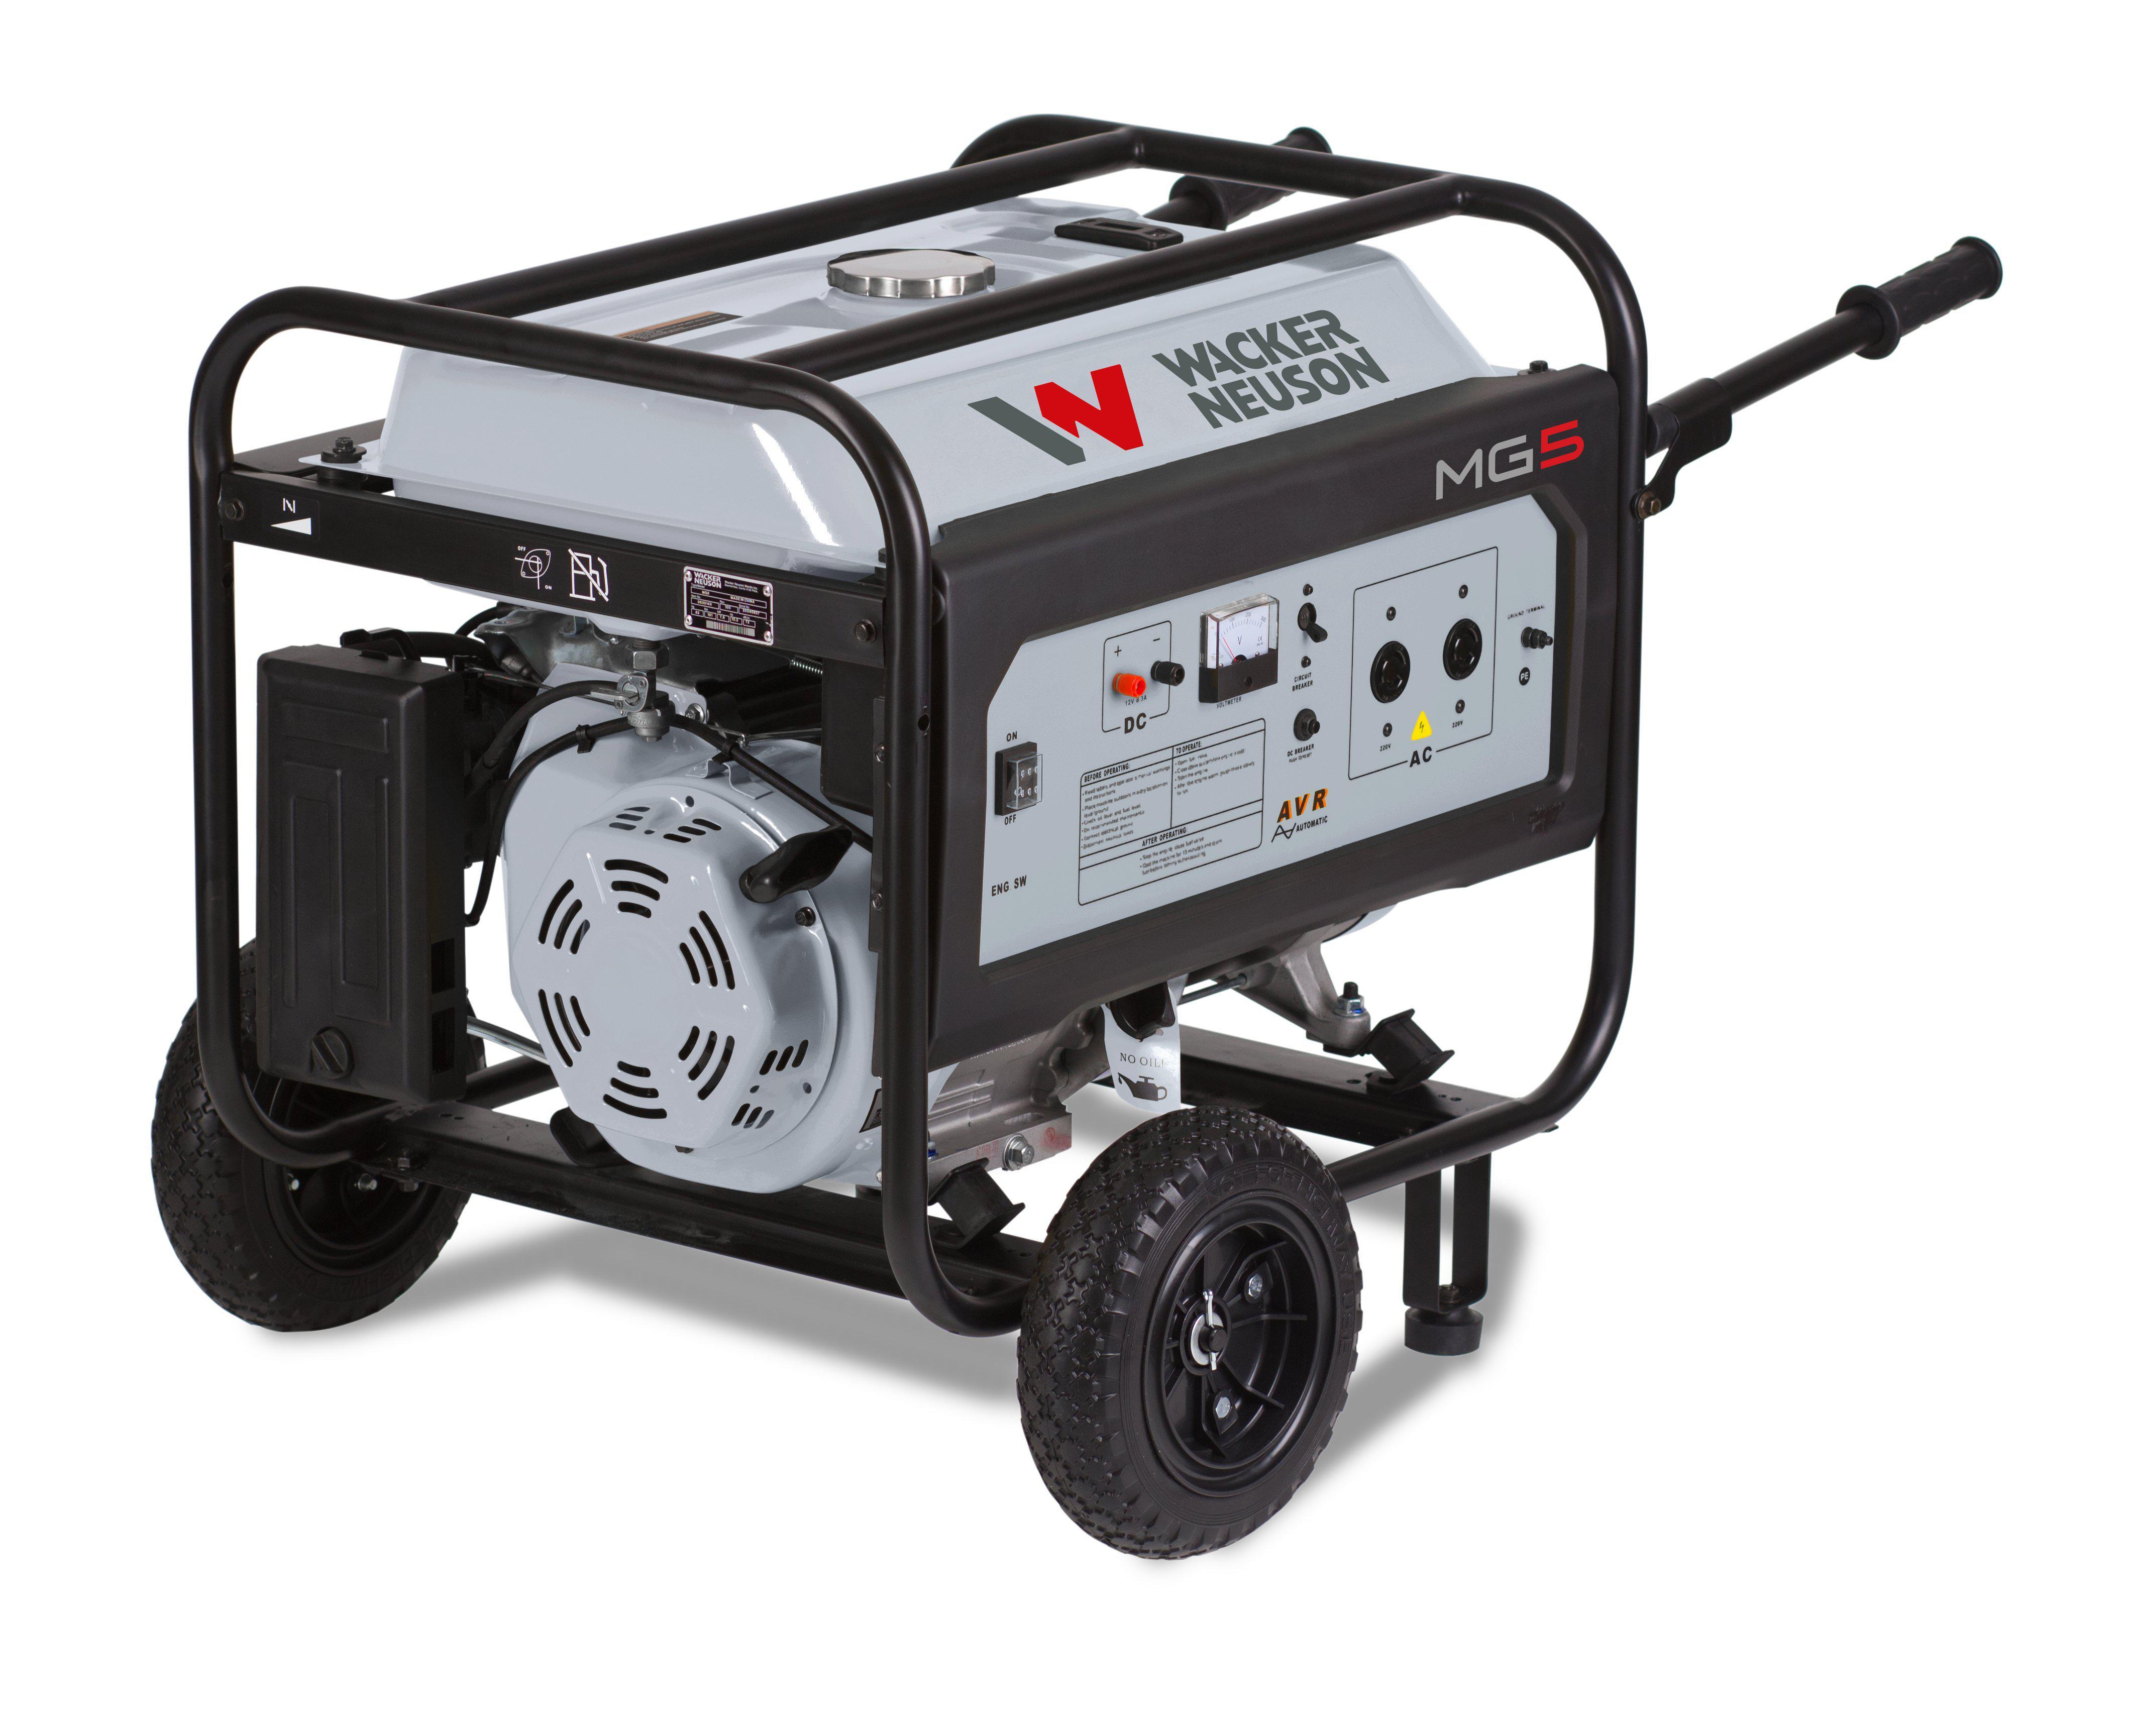 Бензиновый генератор Wacker neuson Mg5-ce